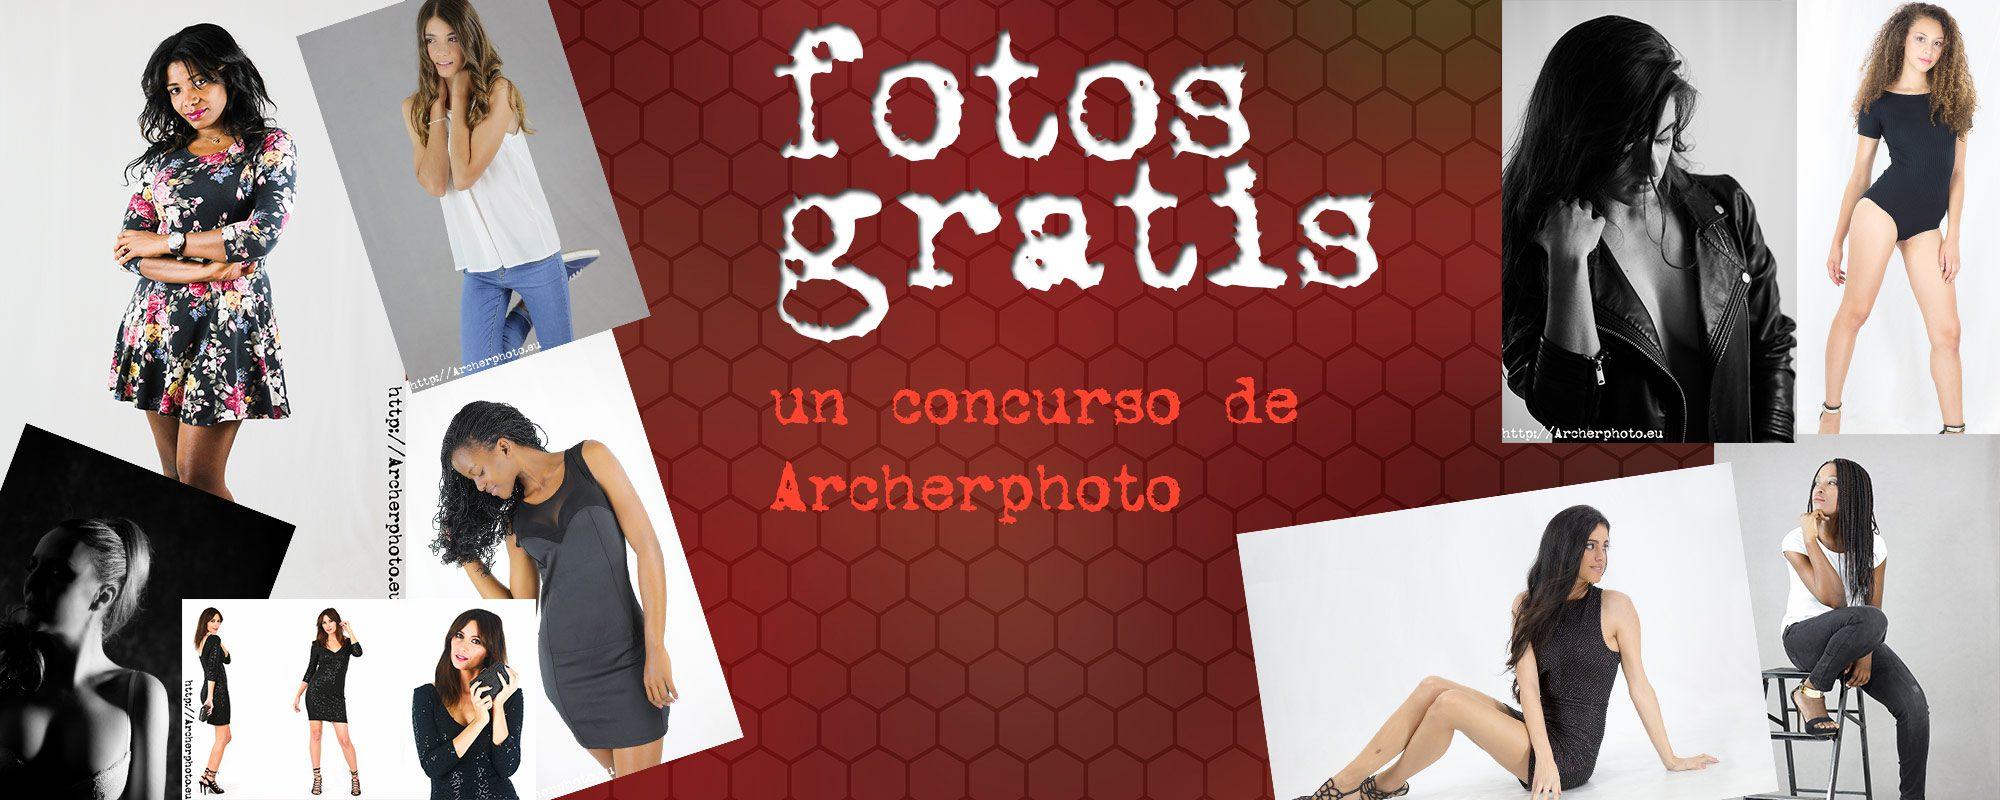 fotos gratis Valencia